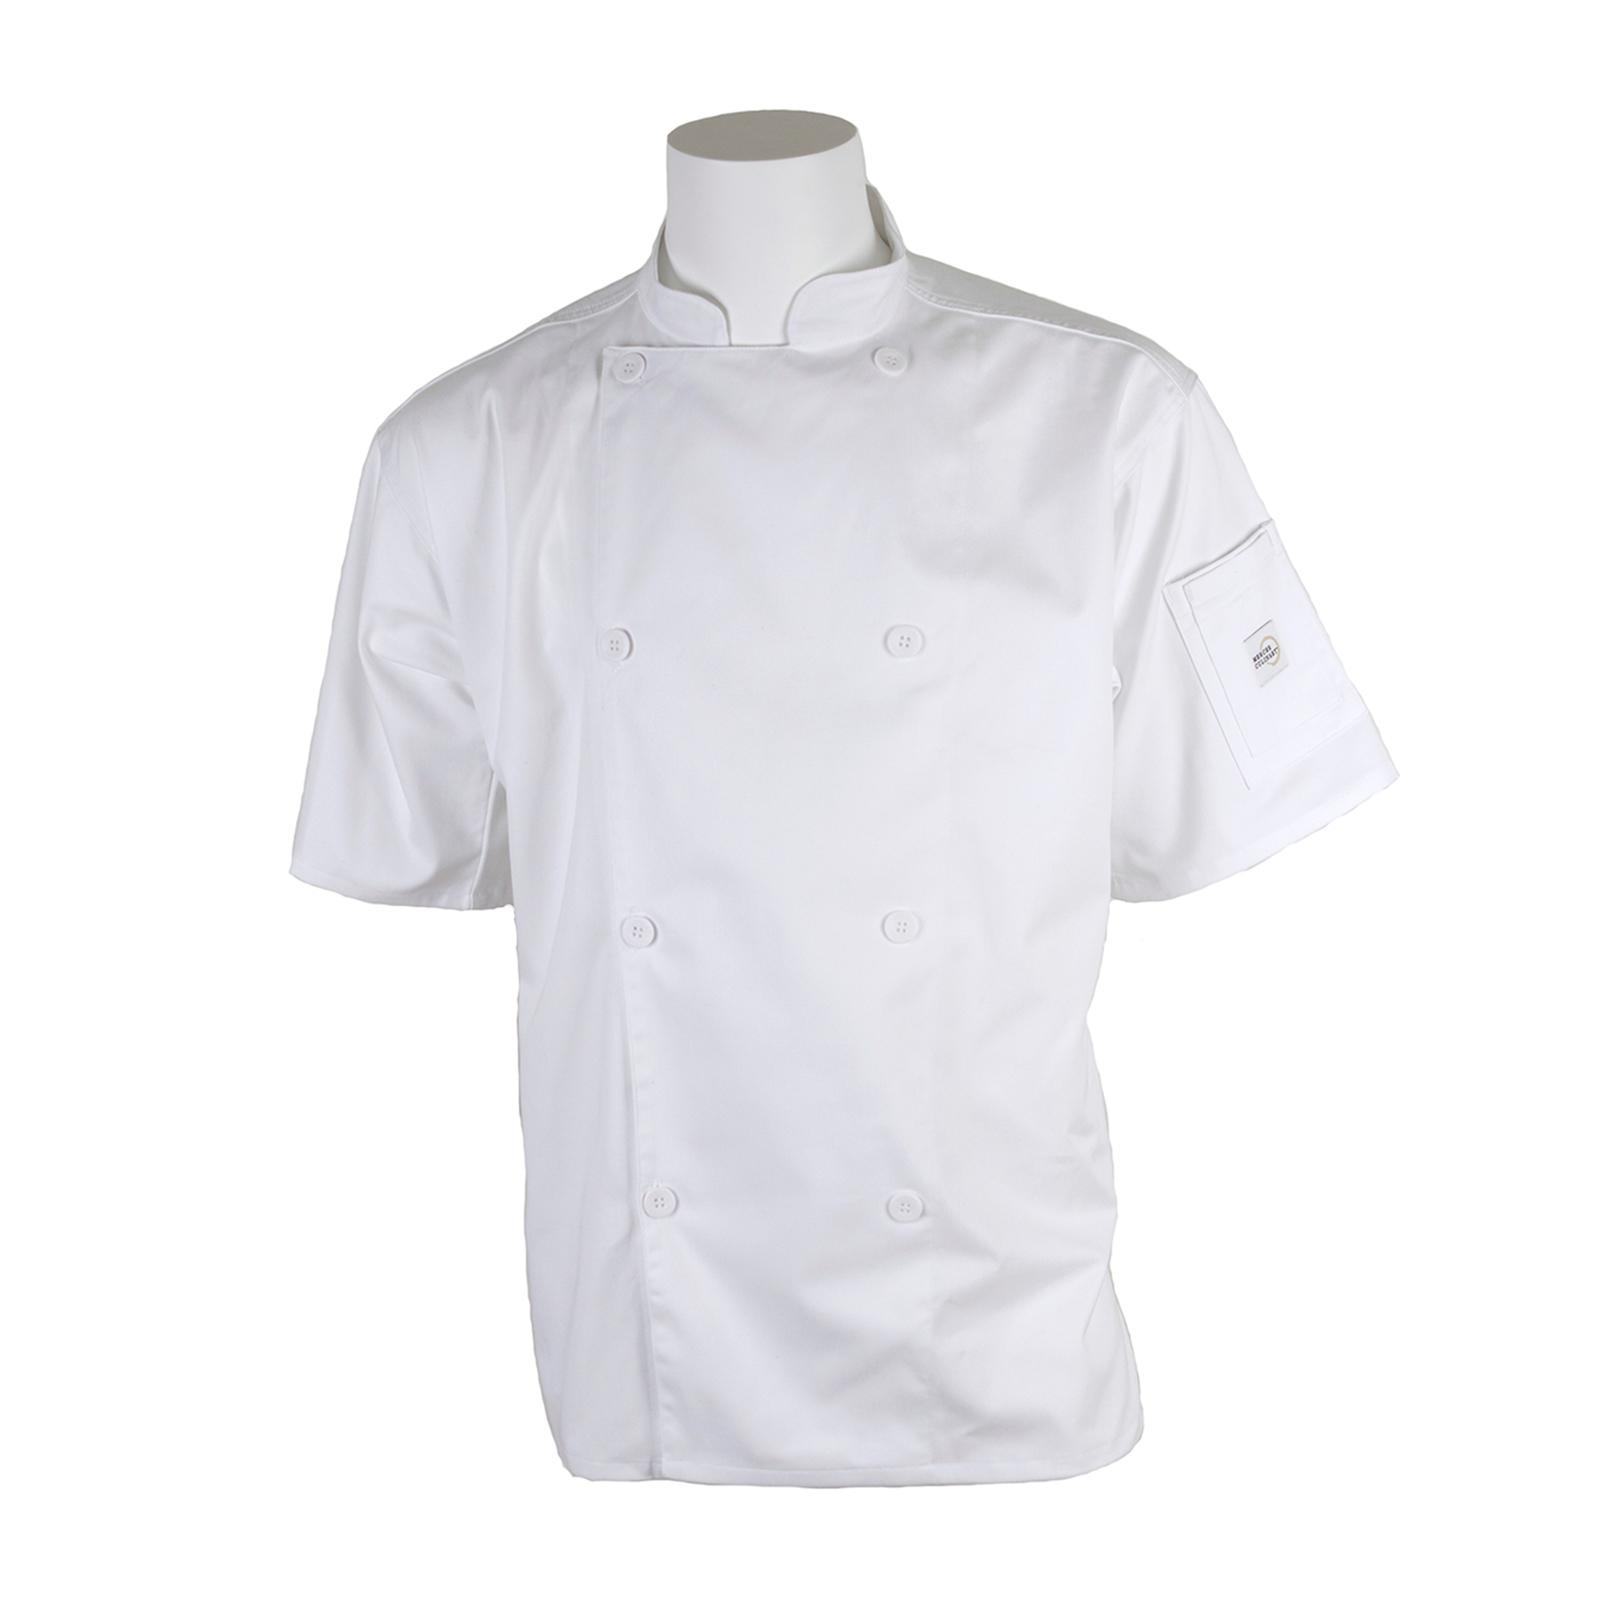 Mercer Culinary M61012WH5X chef's coat